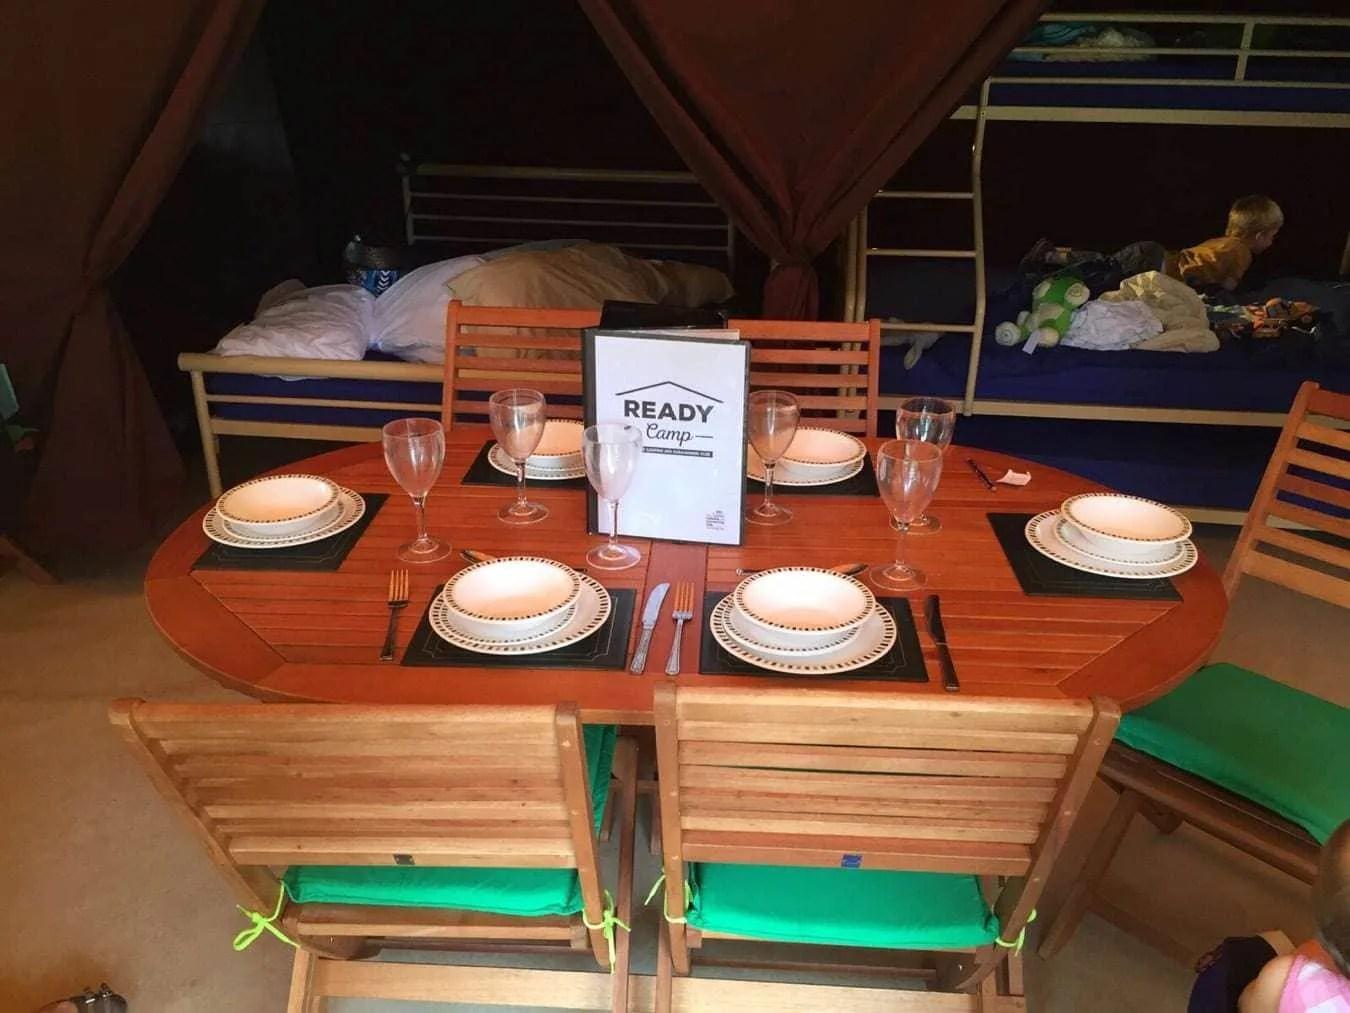 Ready Camp At Blackmore Camping And Caravan Club Site